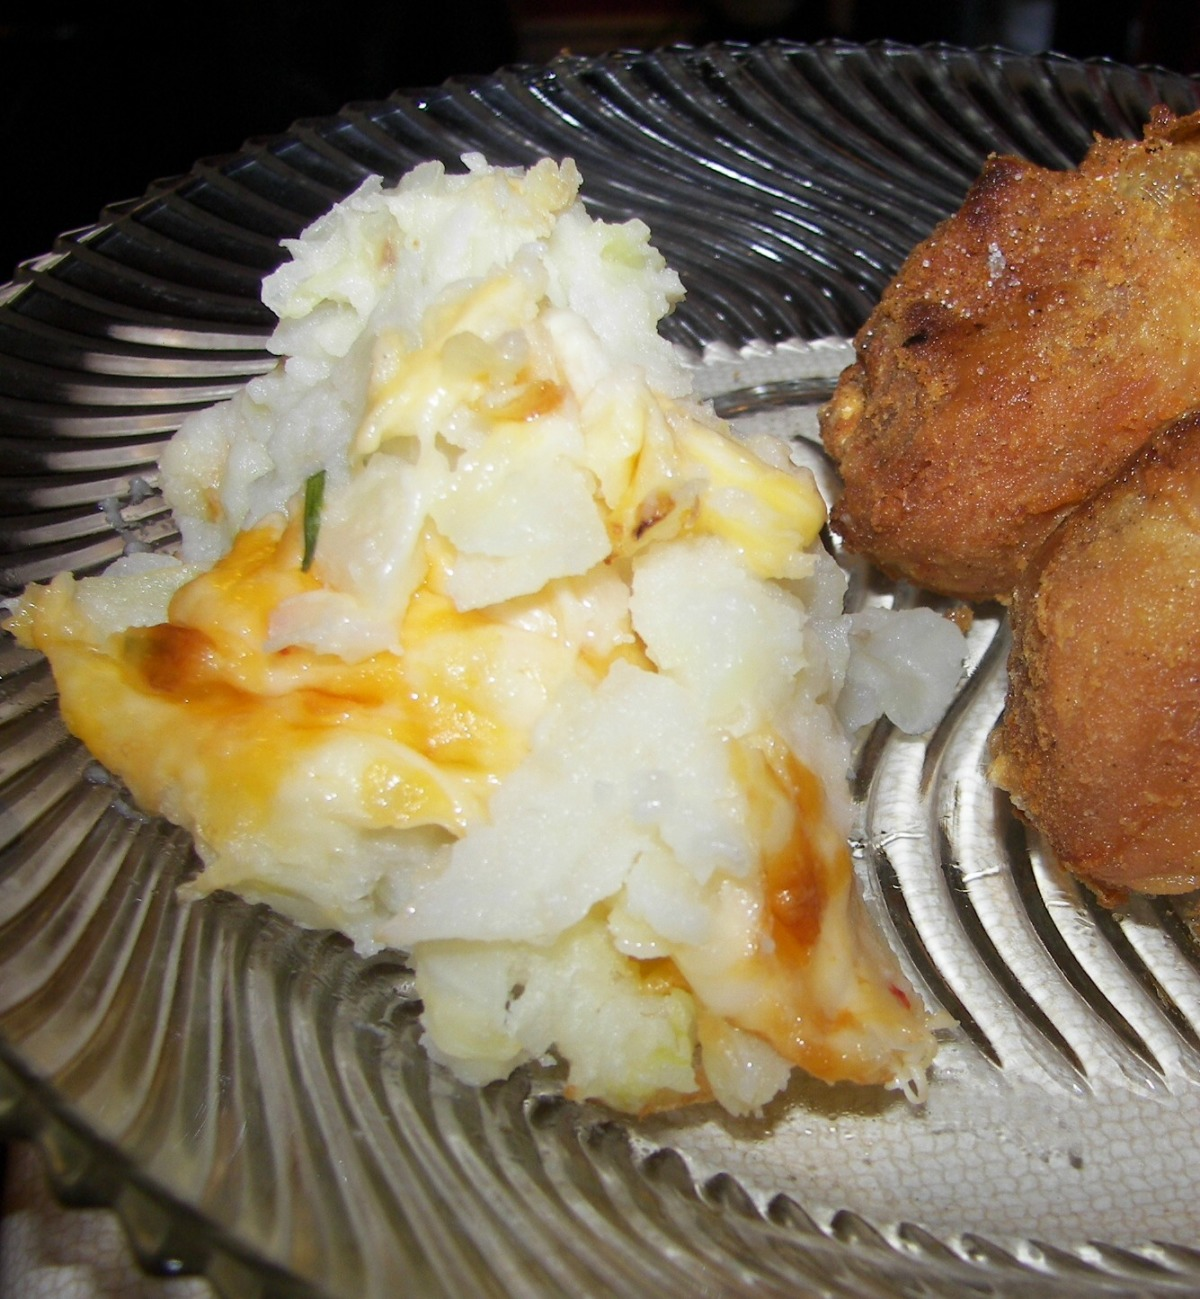 Rumbledethumps - Celtic Potato, Cabbage & Cheese Gratin image